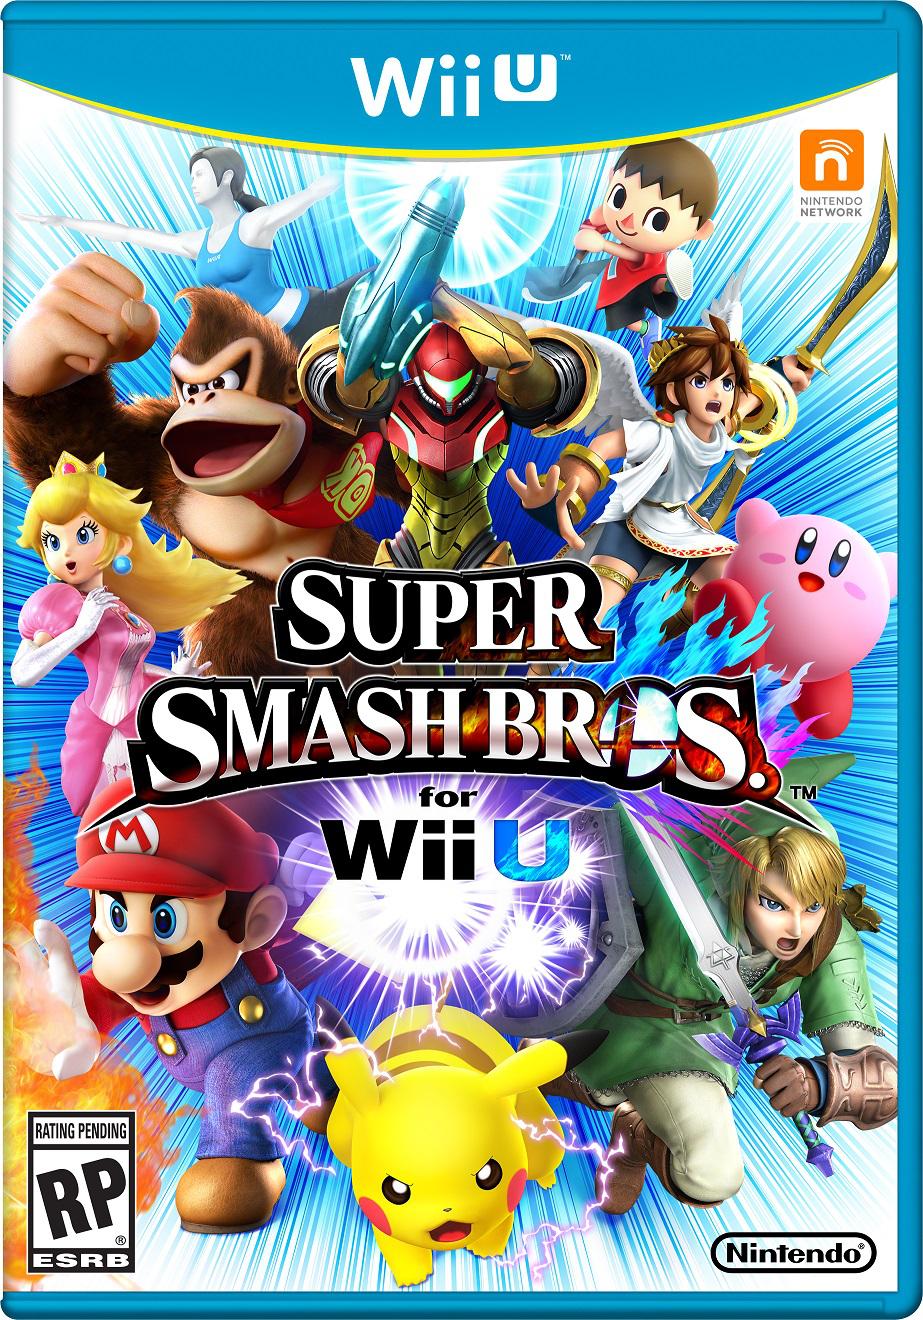 Super Smash Bros Wii U (avec 20€ sur la carte)